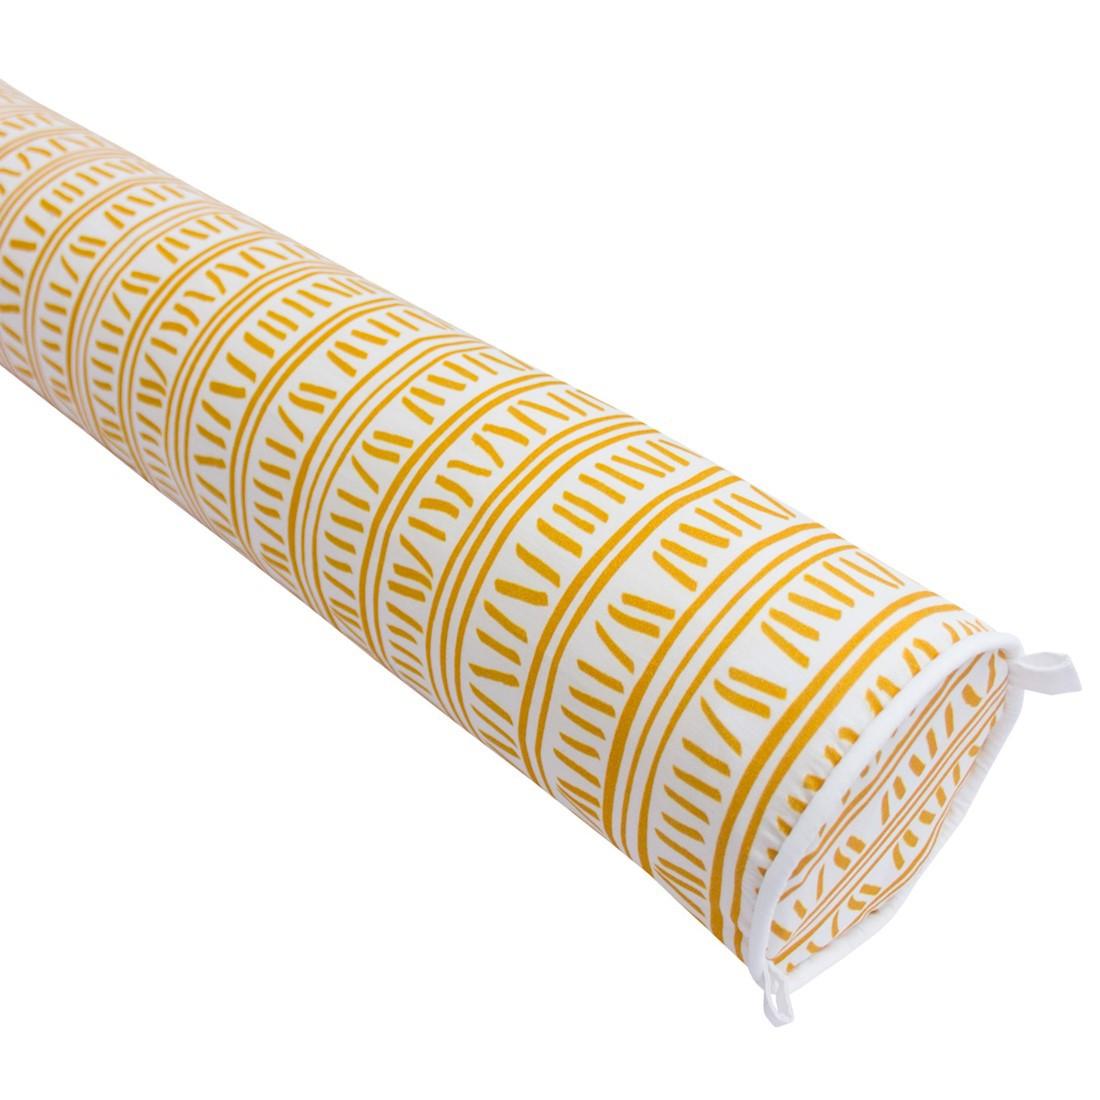 Rolo 162 cm trilha amarelo ocre